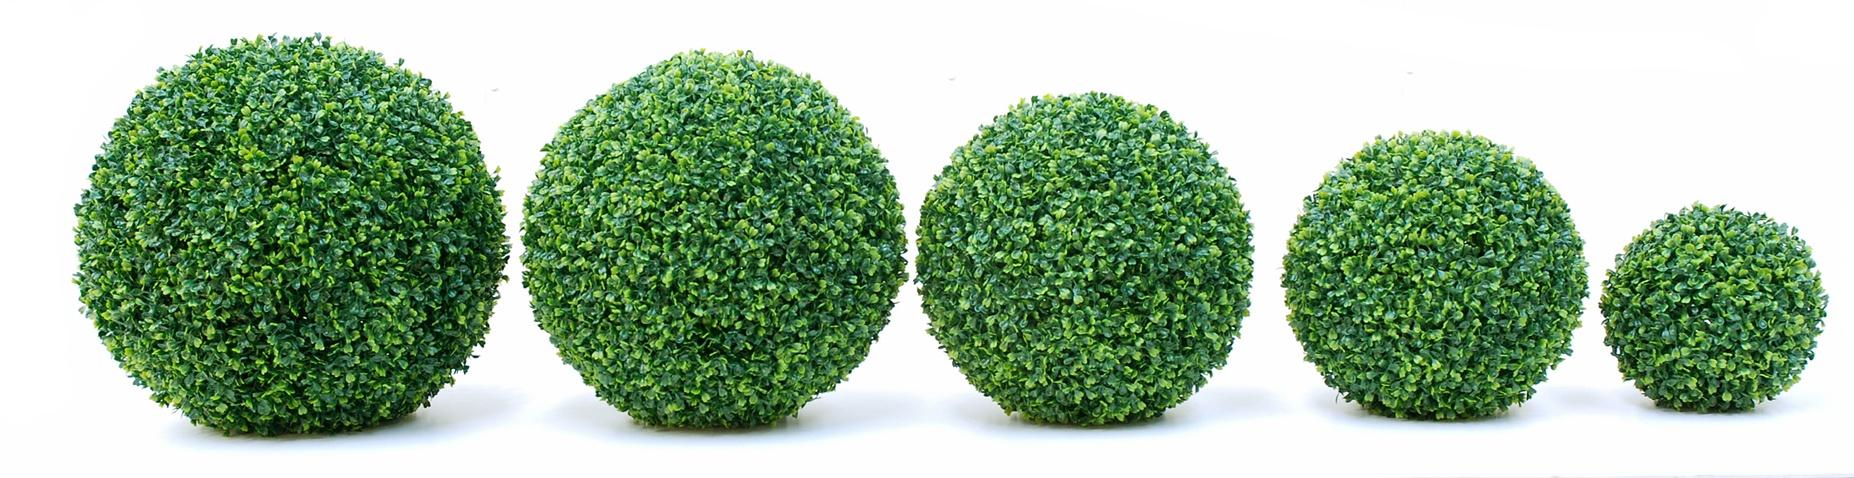 boxwood_balls_02.jpg